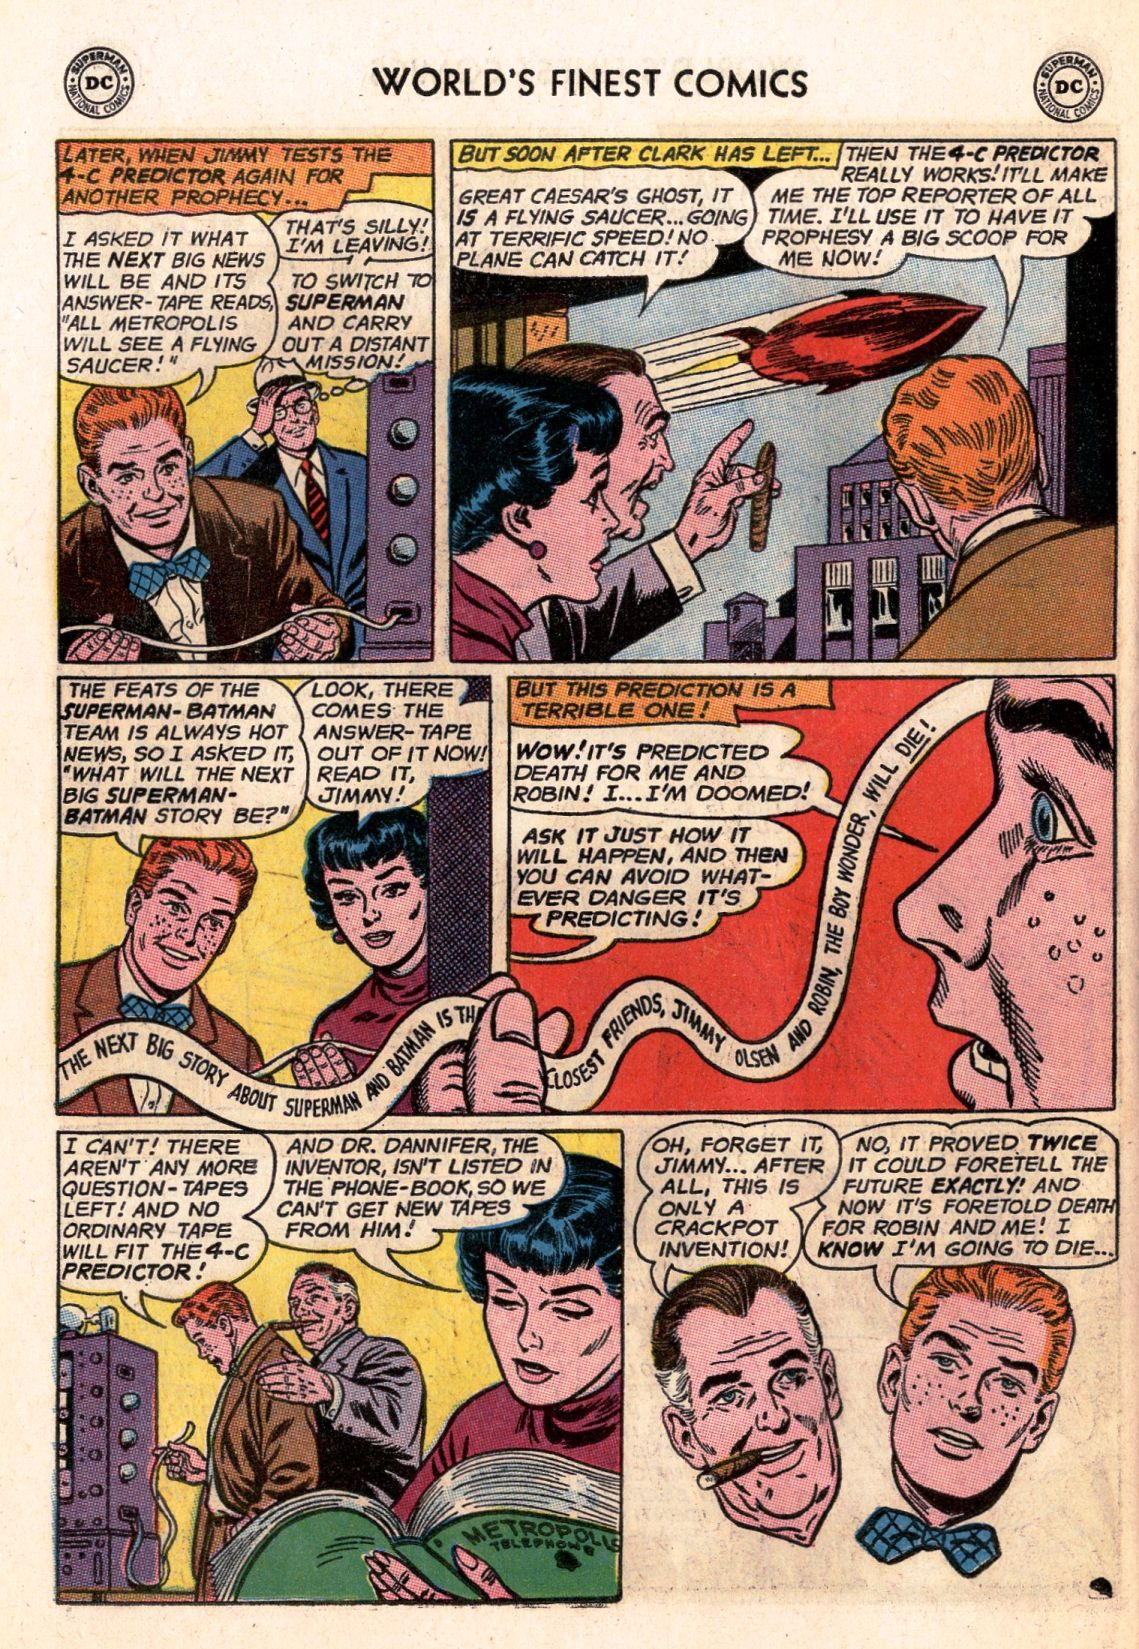 Read online World's Finest Comics comic -  Issue #141 - 6